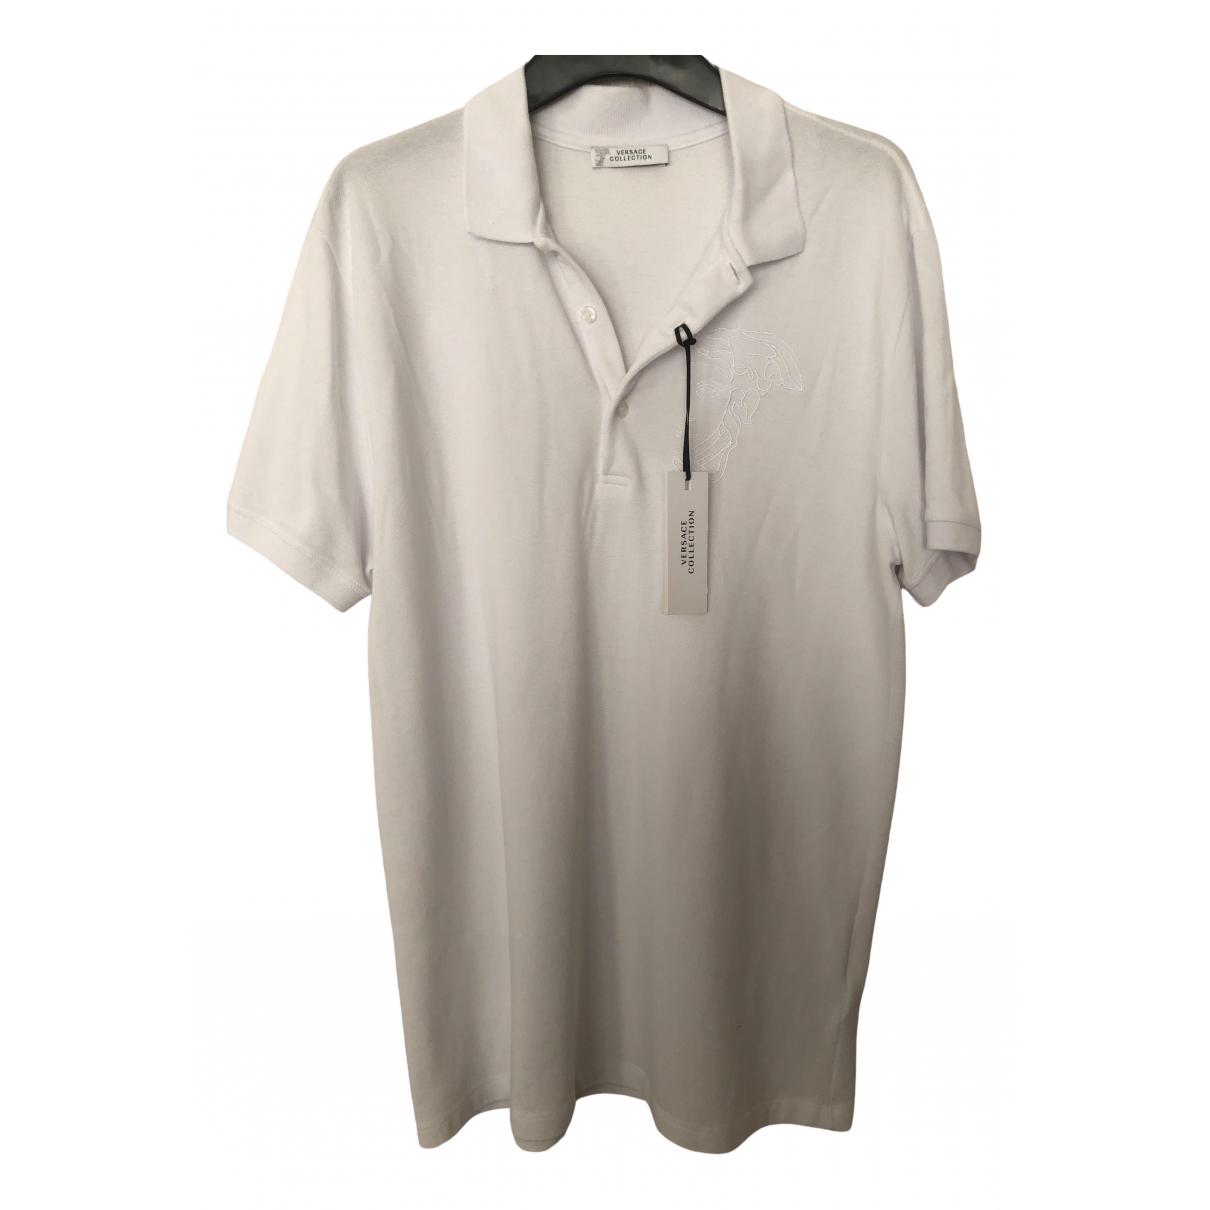 Gianni Versace \N White Cotton Polo shirts for Men L International